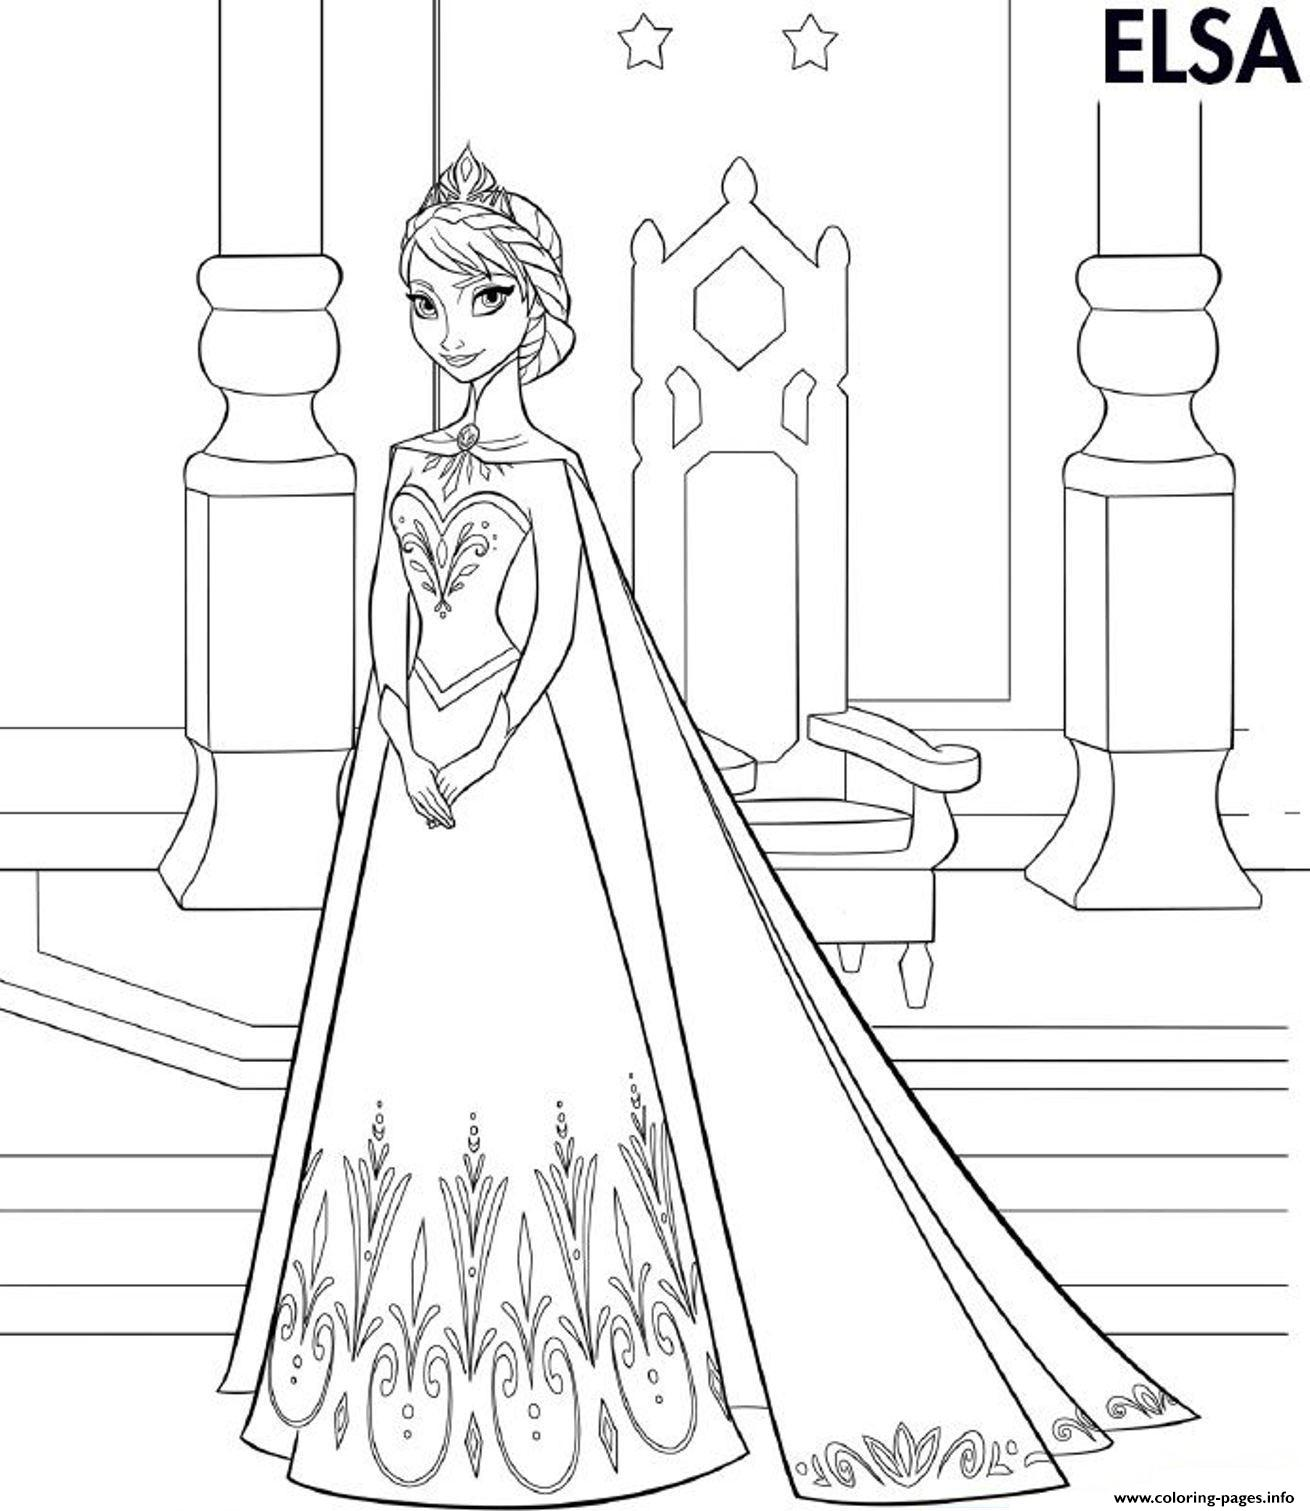 Elsa Frozen Aa6c Coloring Pages Printable